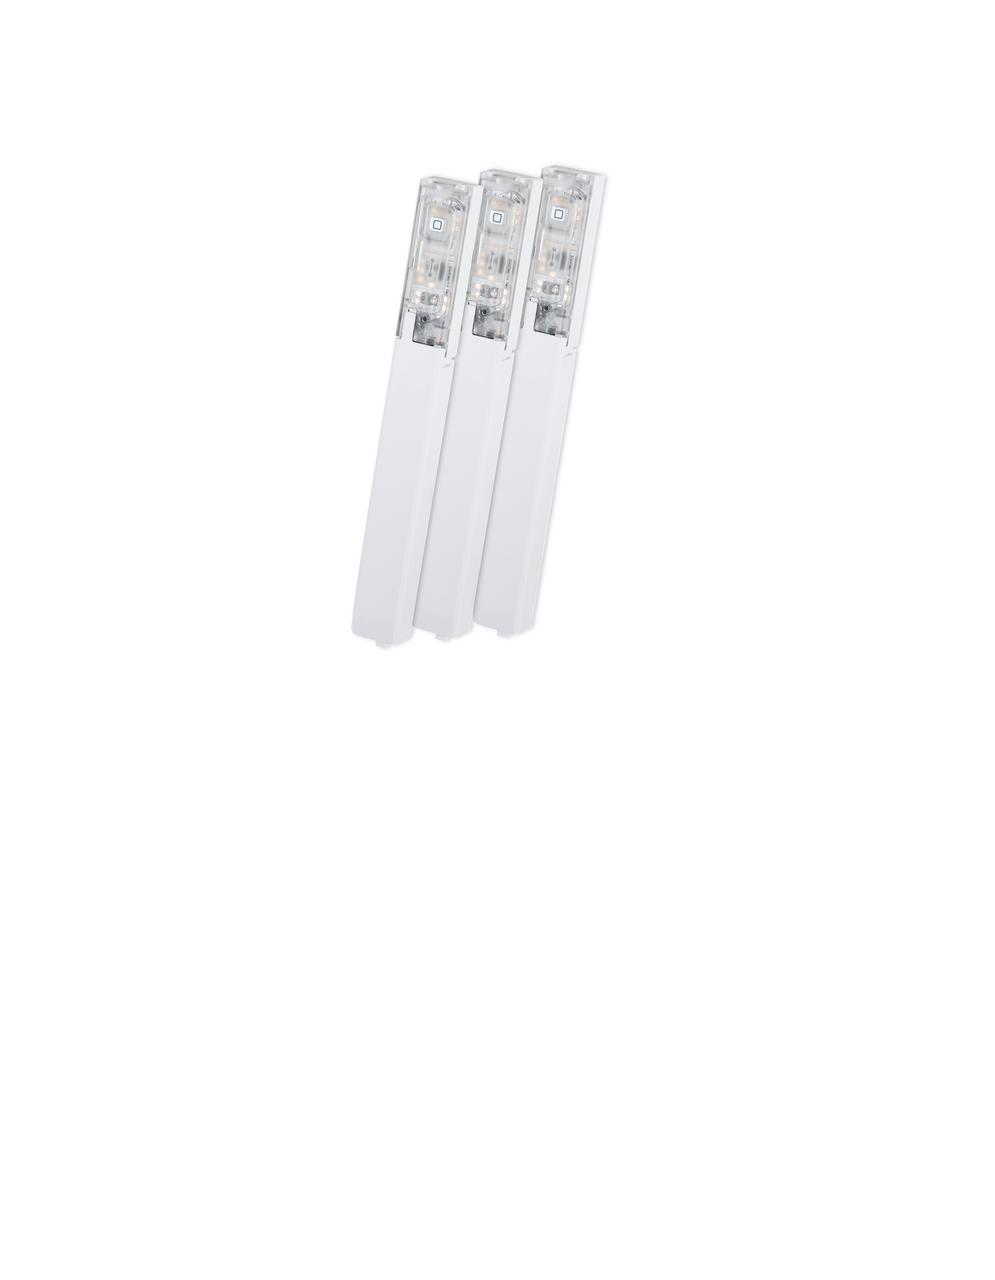 Multi-Set Fenster- / Türkontakt für Rahmenintegration - Homematic IP kompatibel